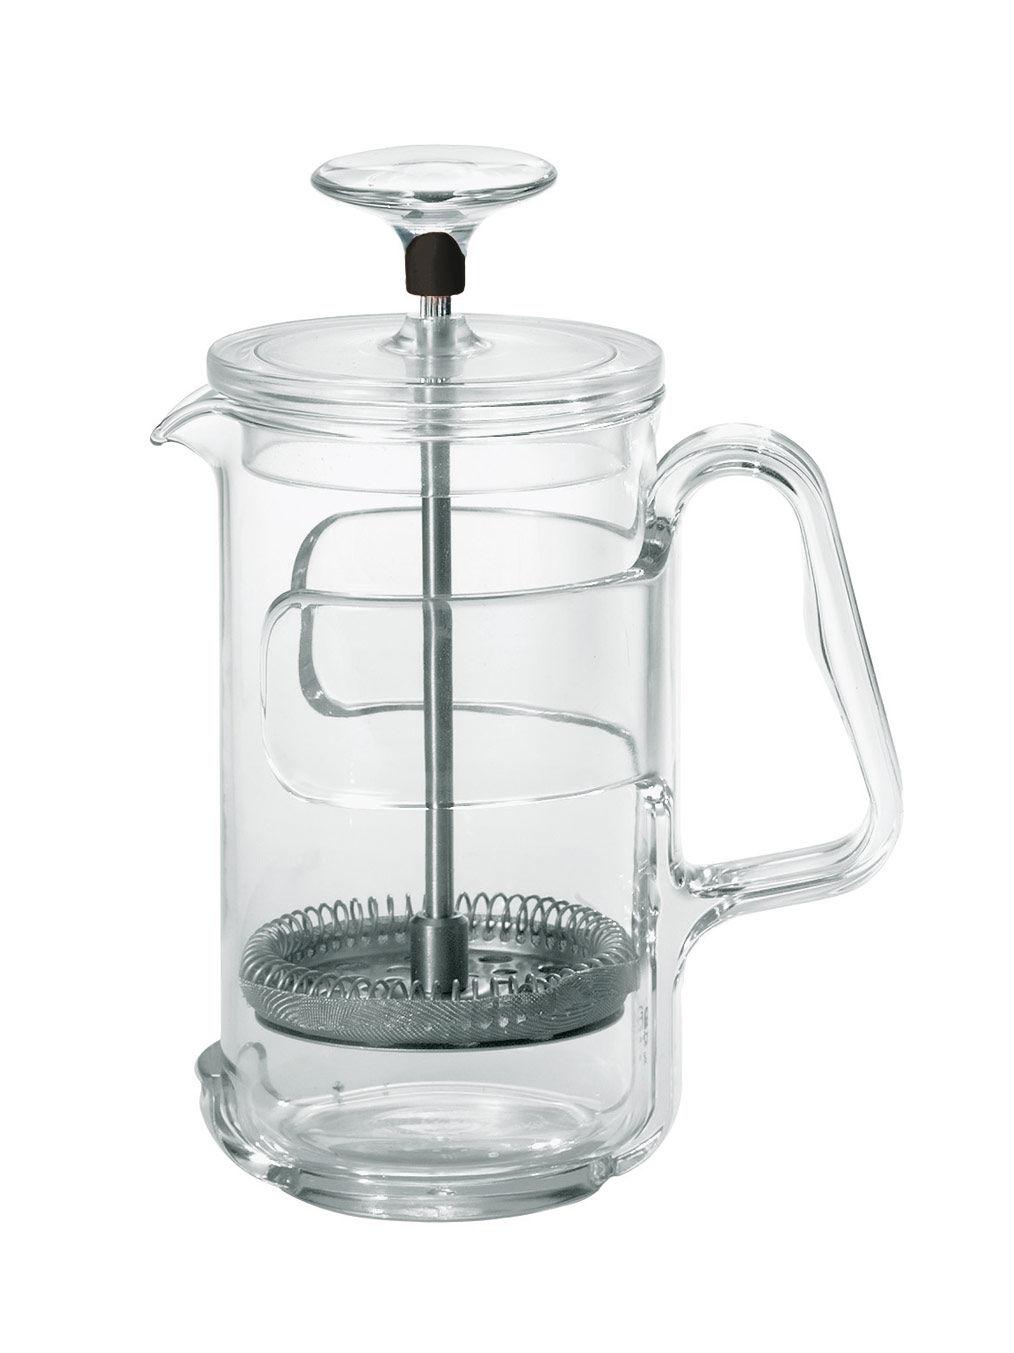 cafeti re piston in fusion pour caf et th 3 tasses 3 tasses noir guzzini. Black Bedroom Furniture Sets. Home Design Ideas